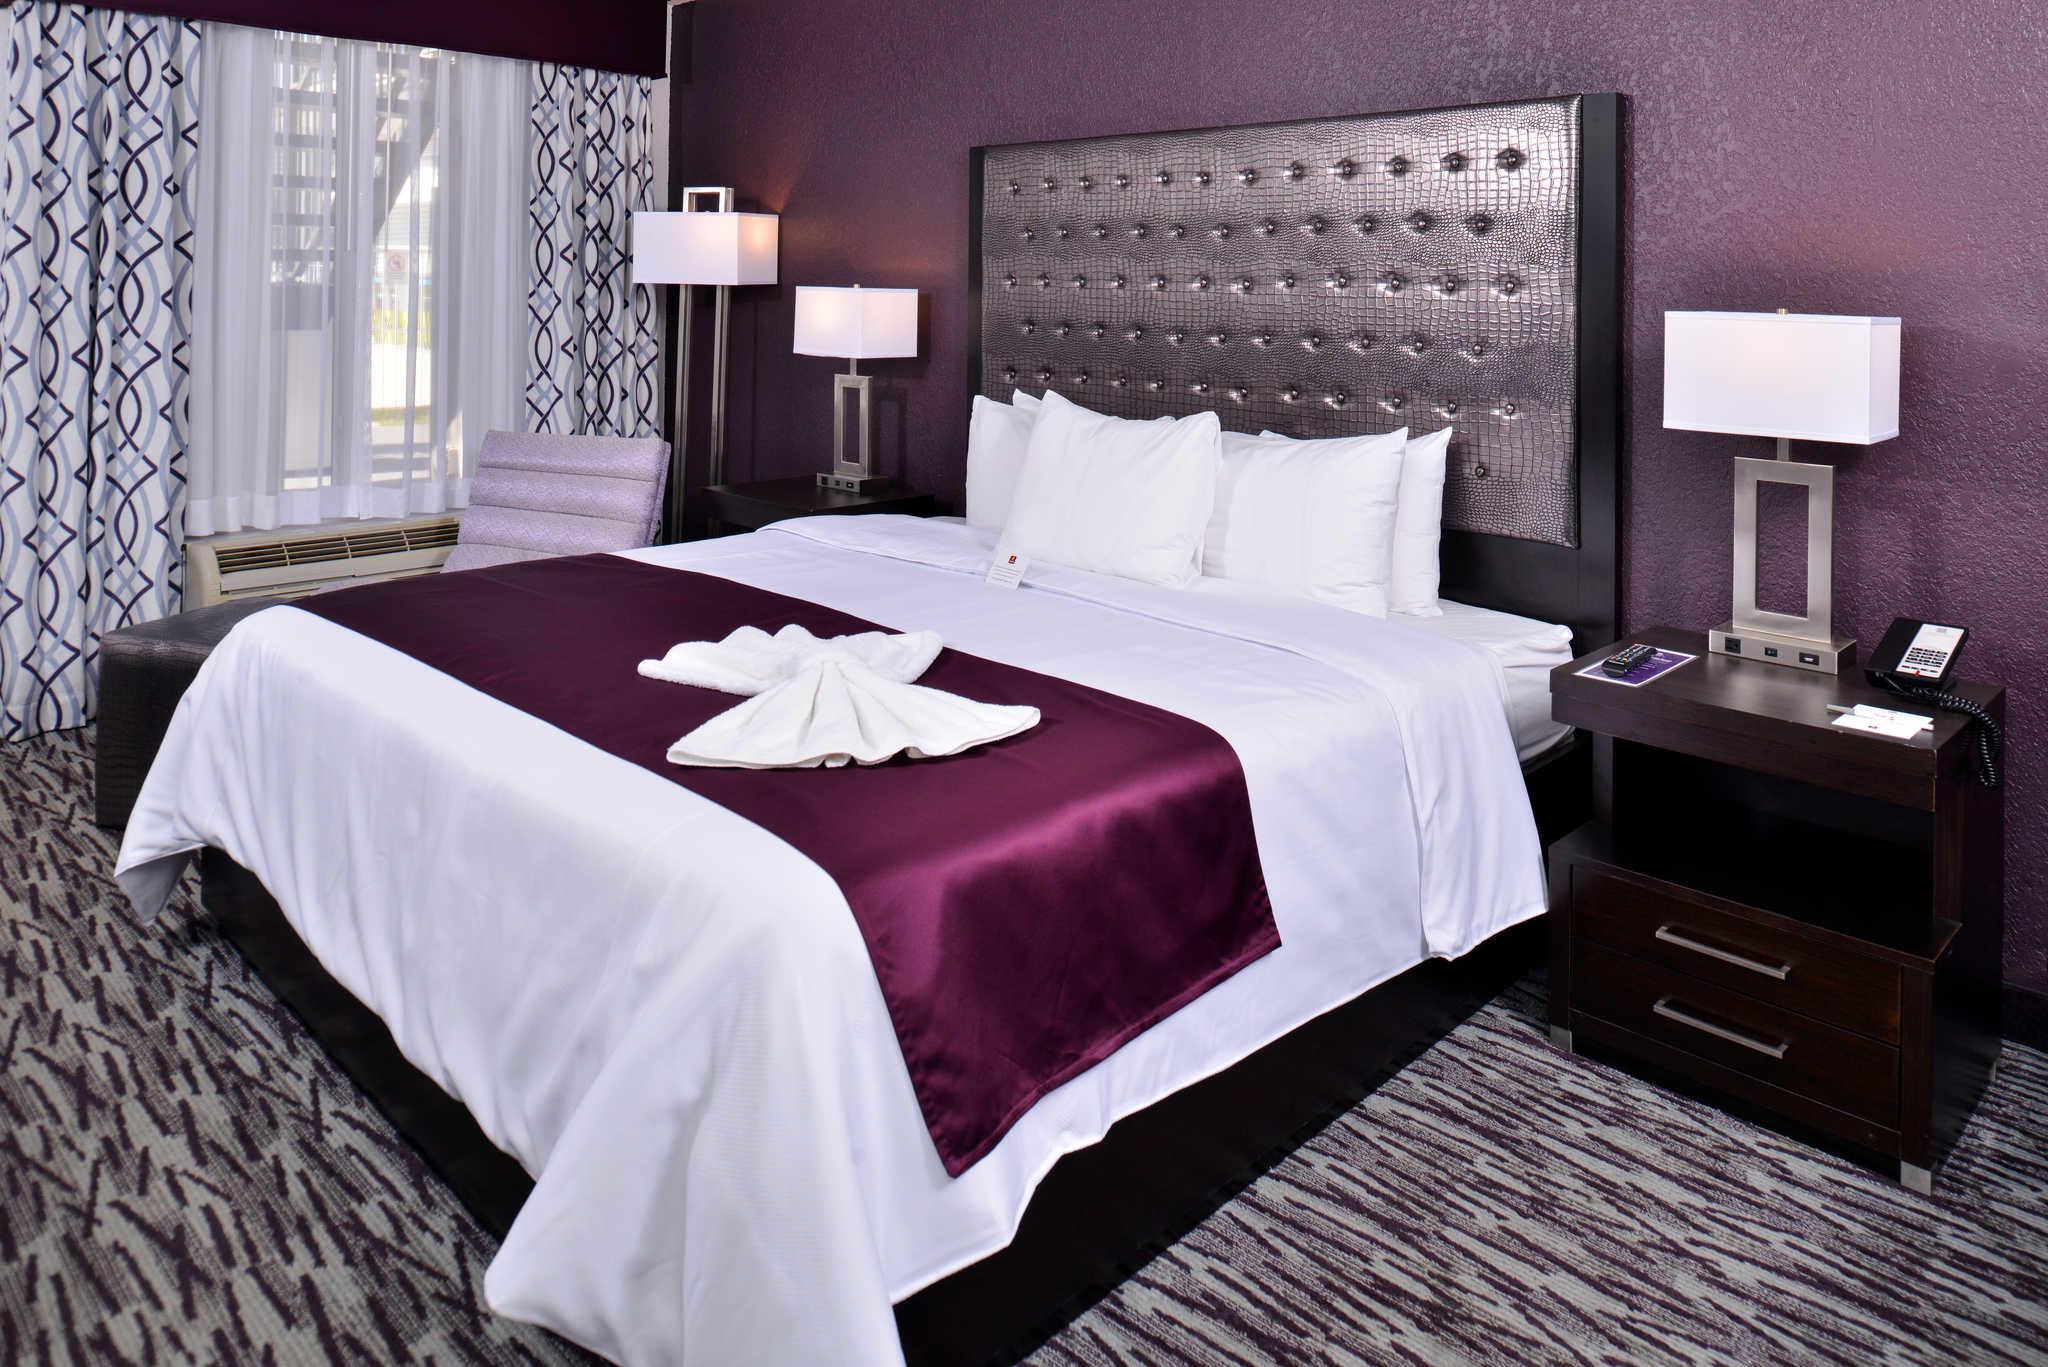 Clarion Inn & Suites Orlando near Theme Parks image 8